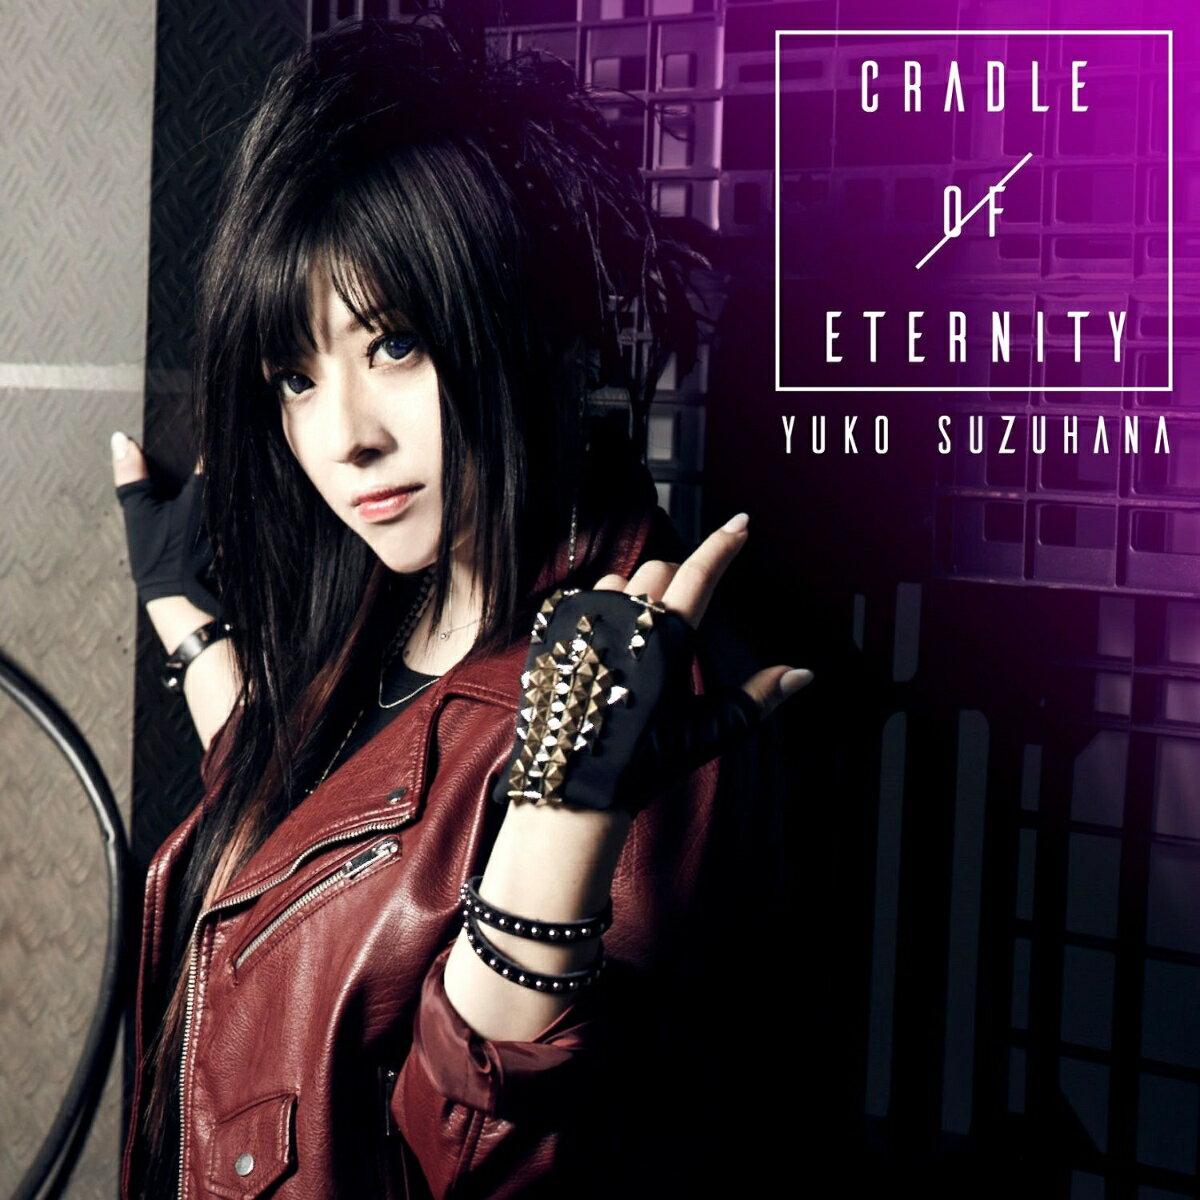 CRADLE OF ETERNITY (CD+Blu-ray+スマプラミュージック&ムービー) [ 鈴華ゆう子 ]